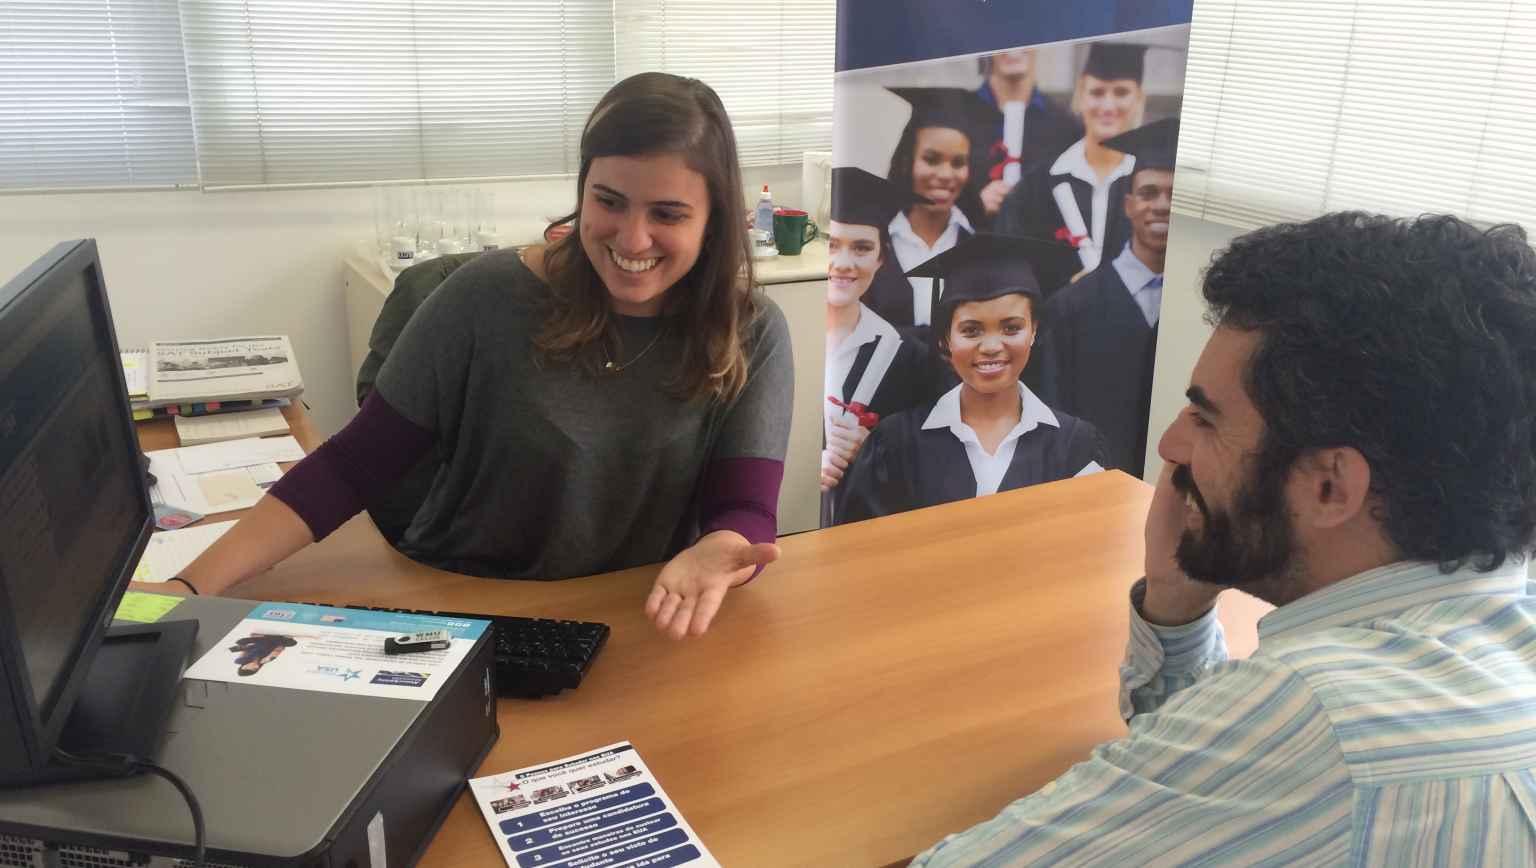 International student financial aid advising for EducationUSA in Sao Paulo